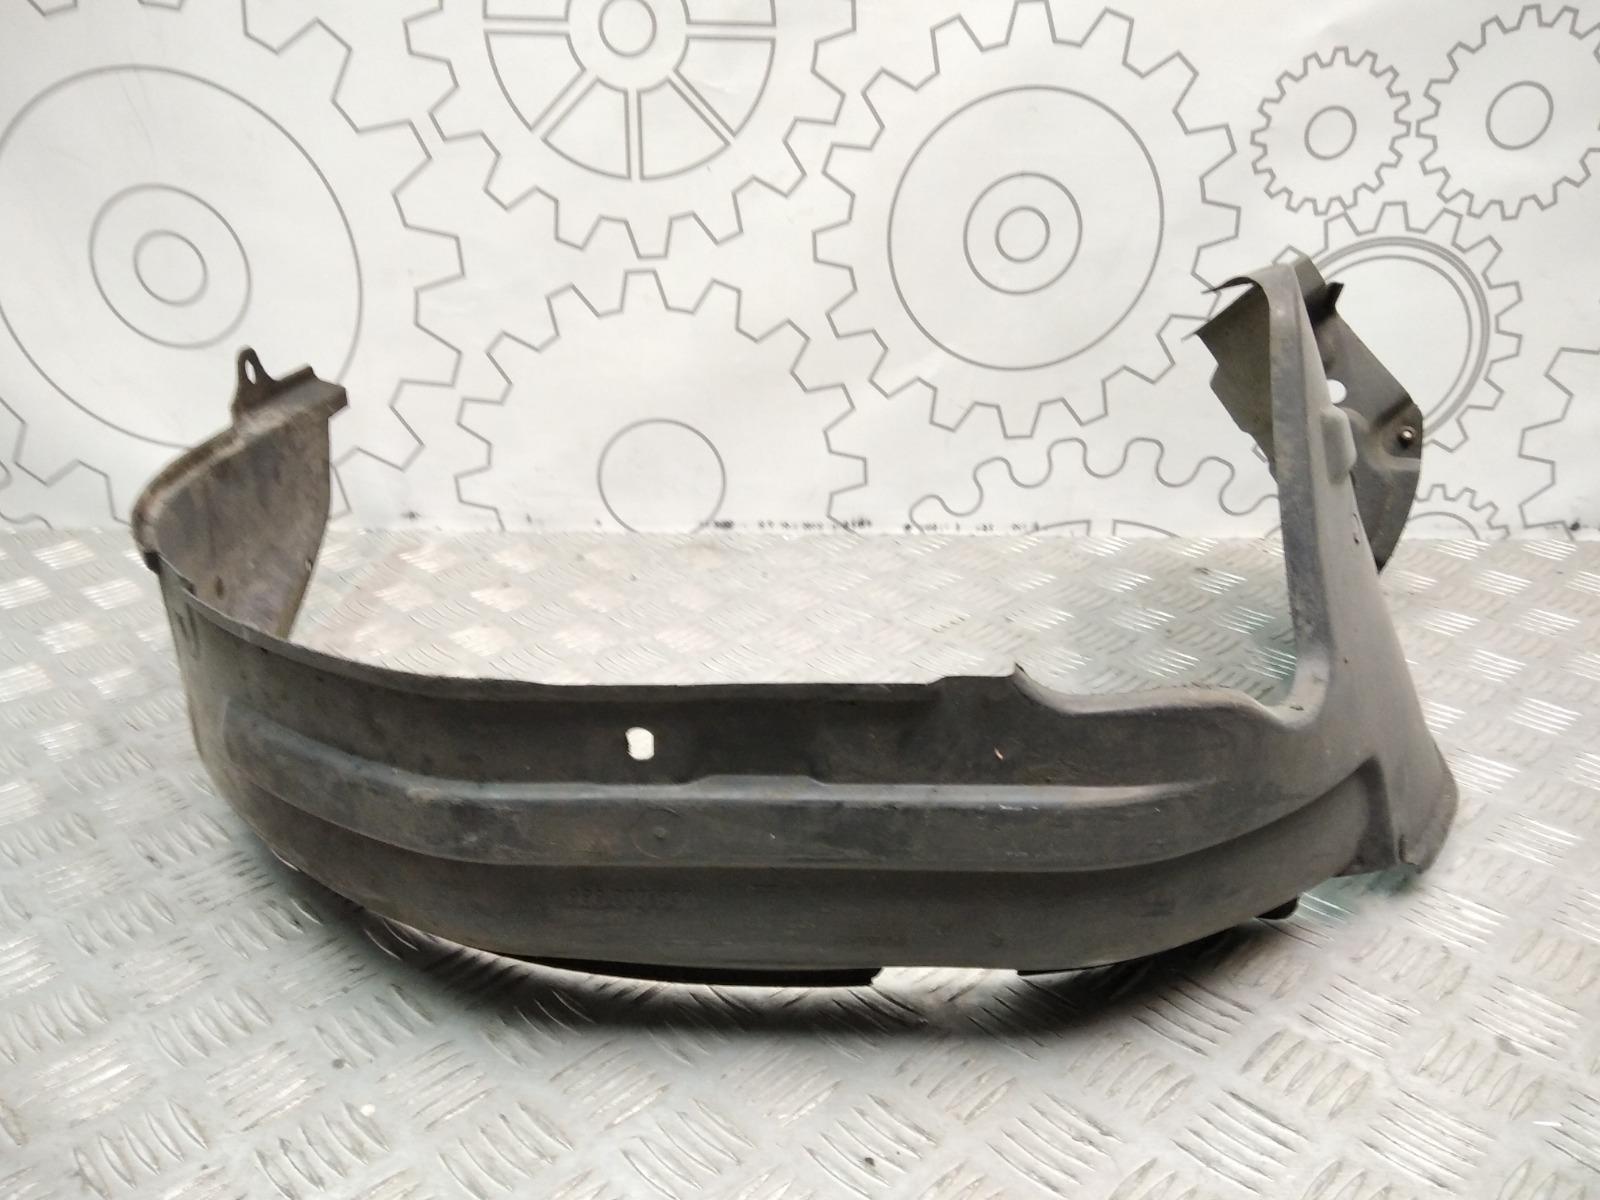 Защита арок передняя правая (подкрылок) Suzuki Wagon R 1.3 I 2001 (б/у)